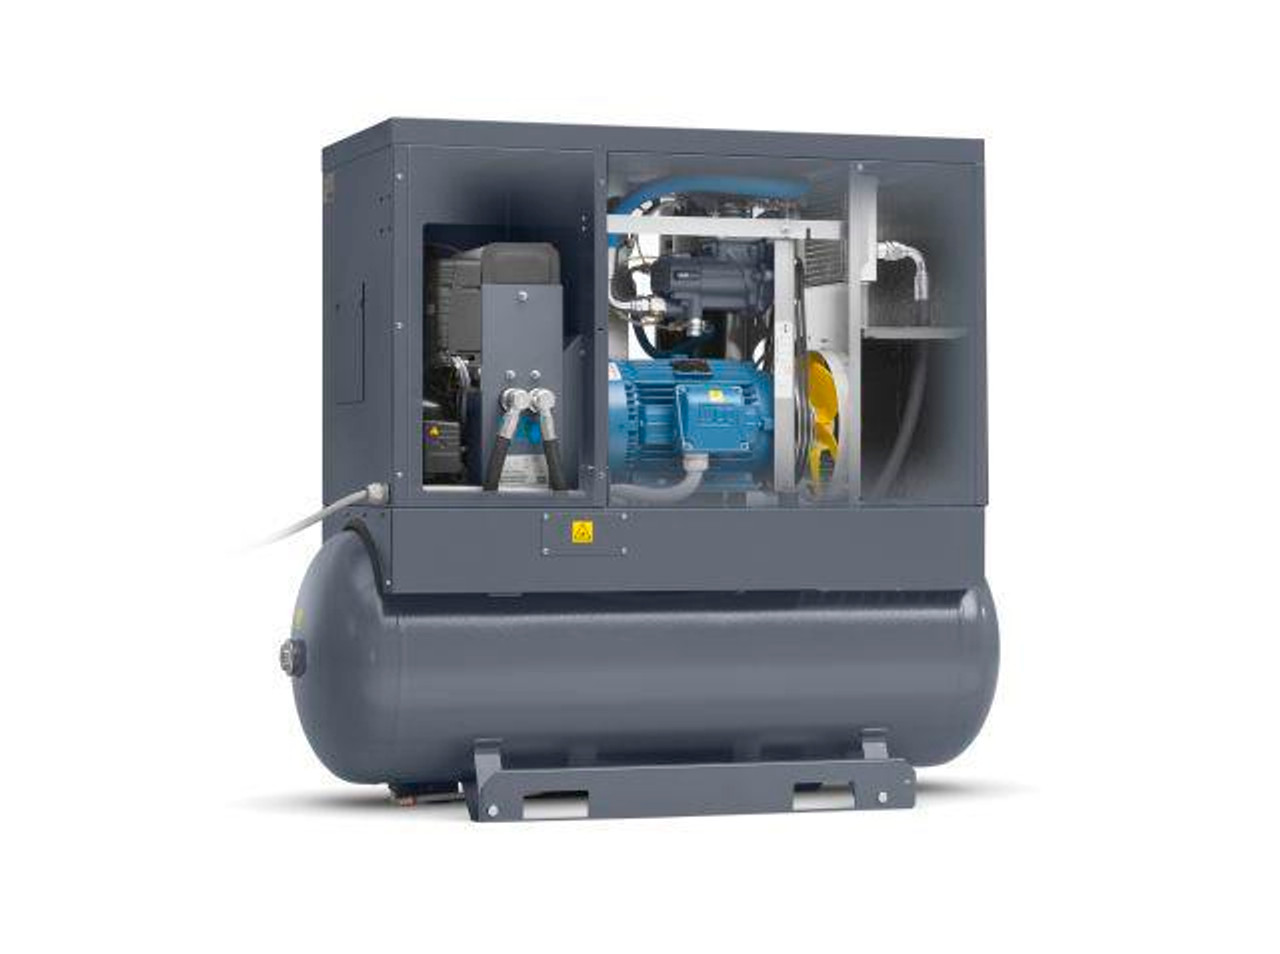 Screw Air Compressor, 25HP, 92.1CFM, 145PSI, Tank Mounted